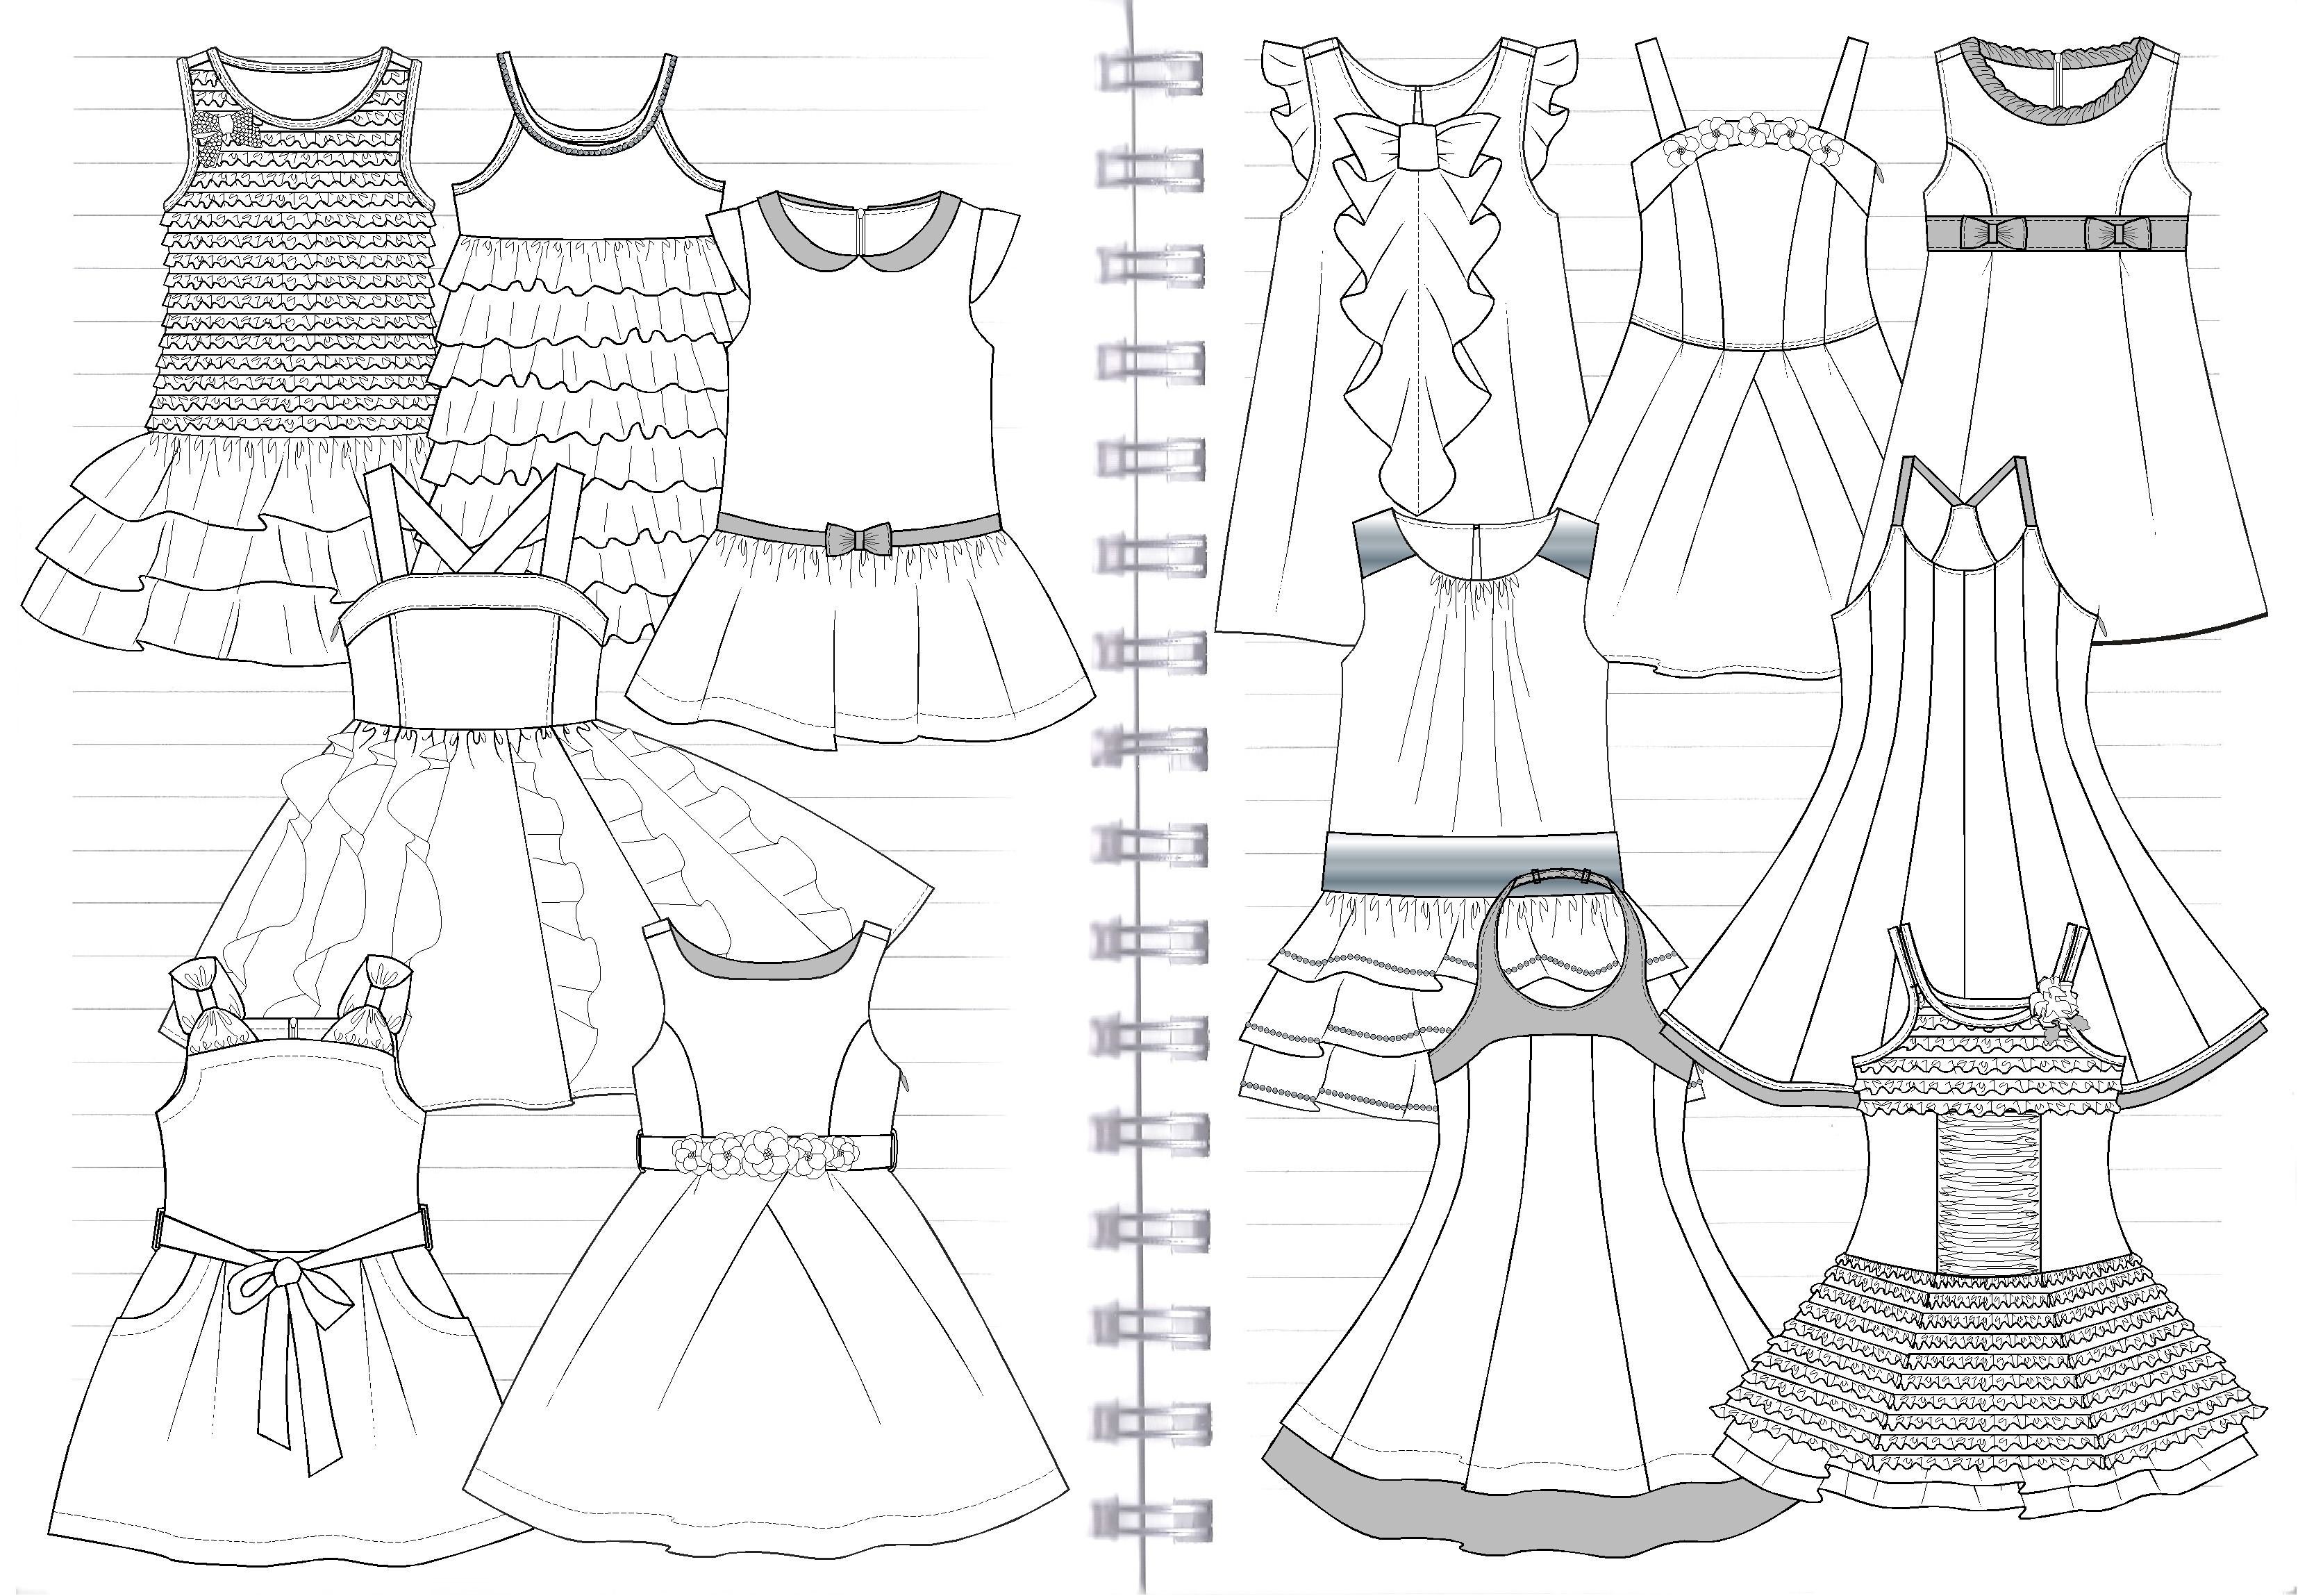 Pin By Jenny Ting On Portfolio 2 Designstudiofourteen Children Fashion Illustration Children Fashion Sketch Kids Garments